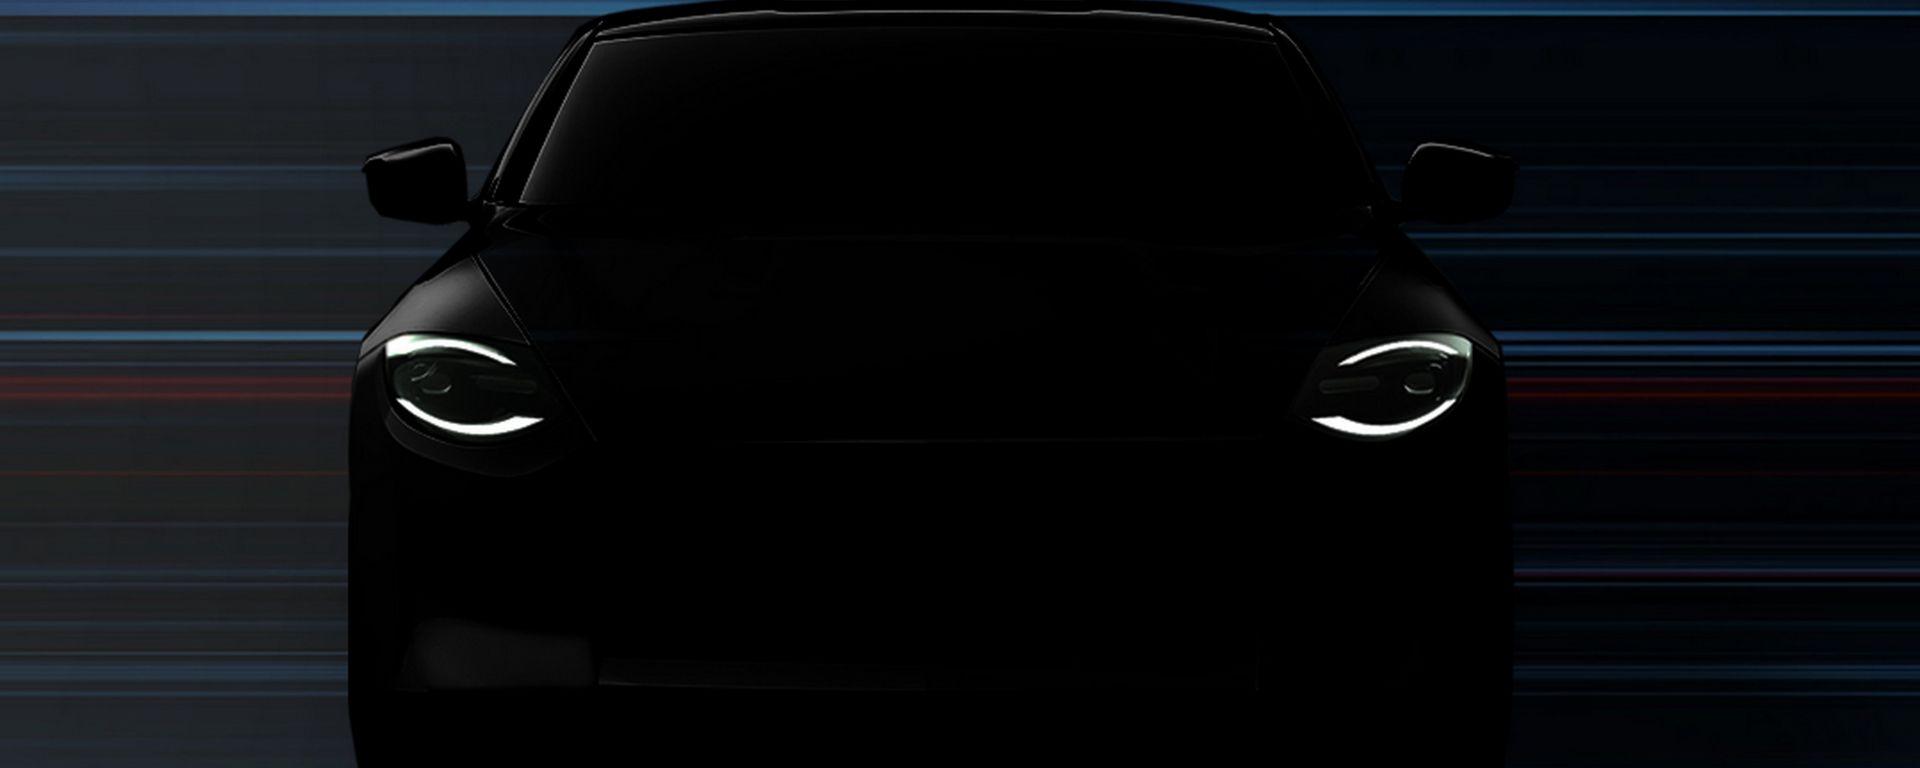 Nuova Nissan 400Z, digital reveal il 16 settembre